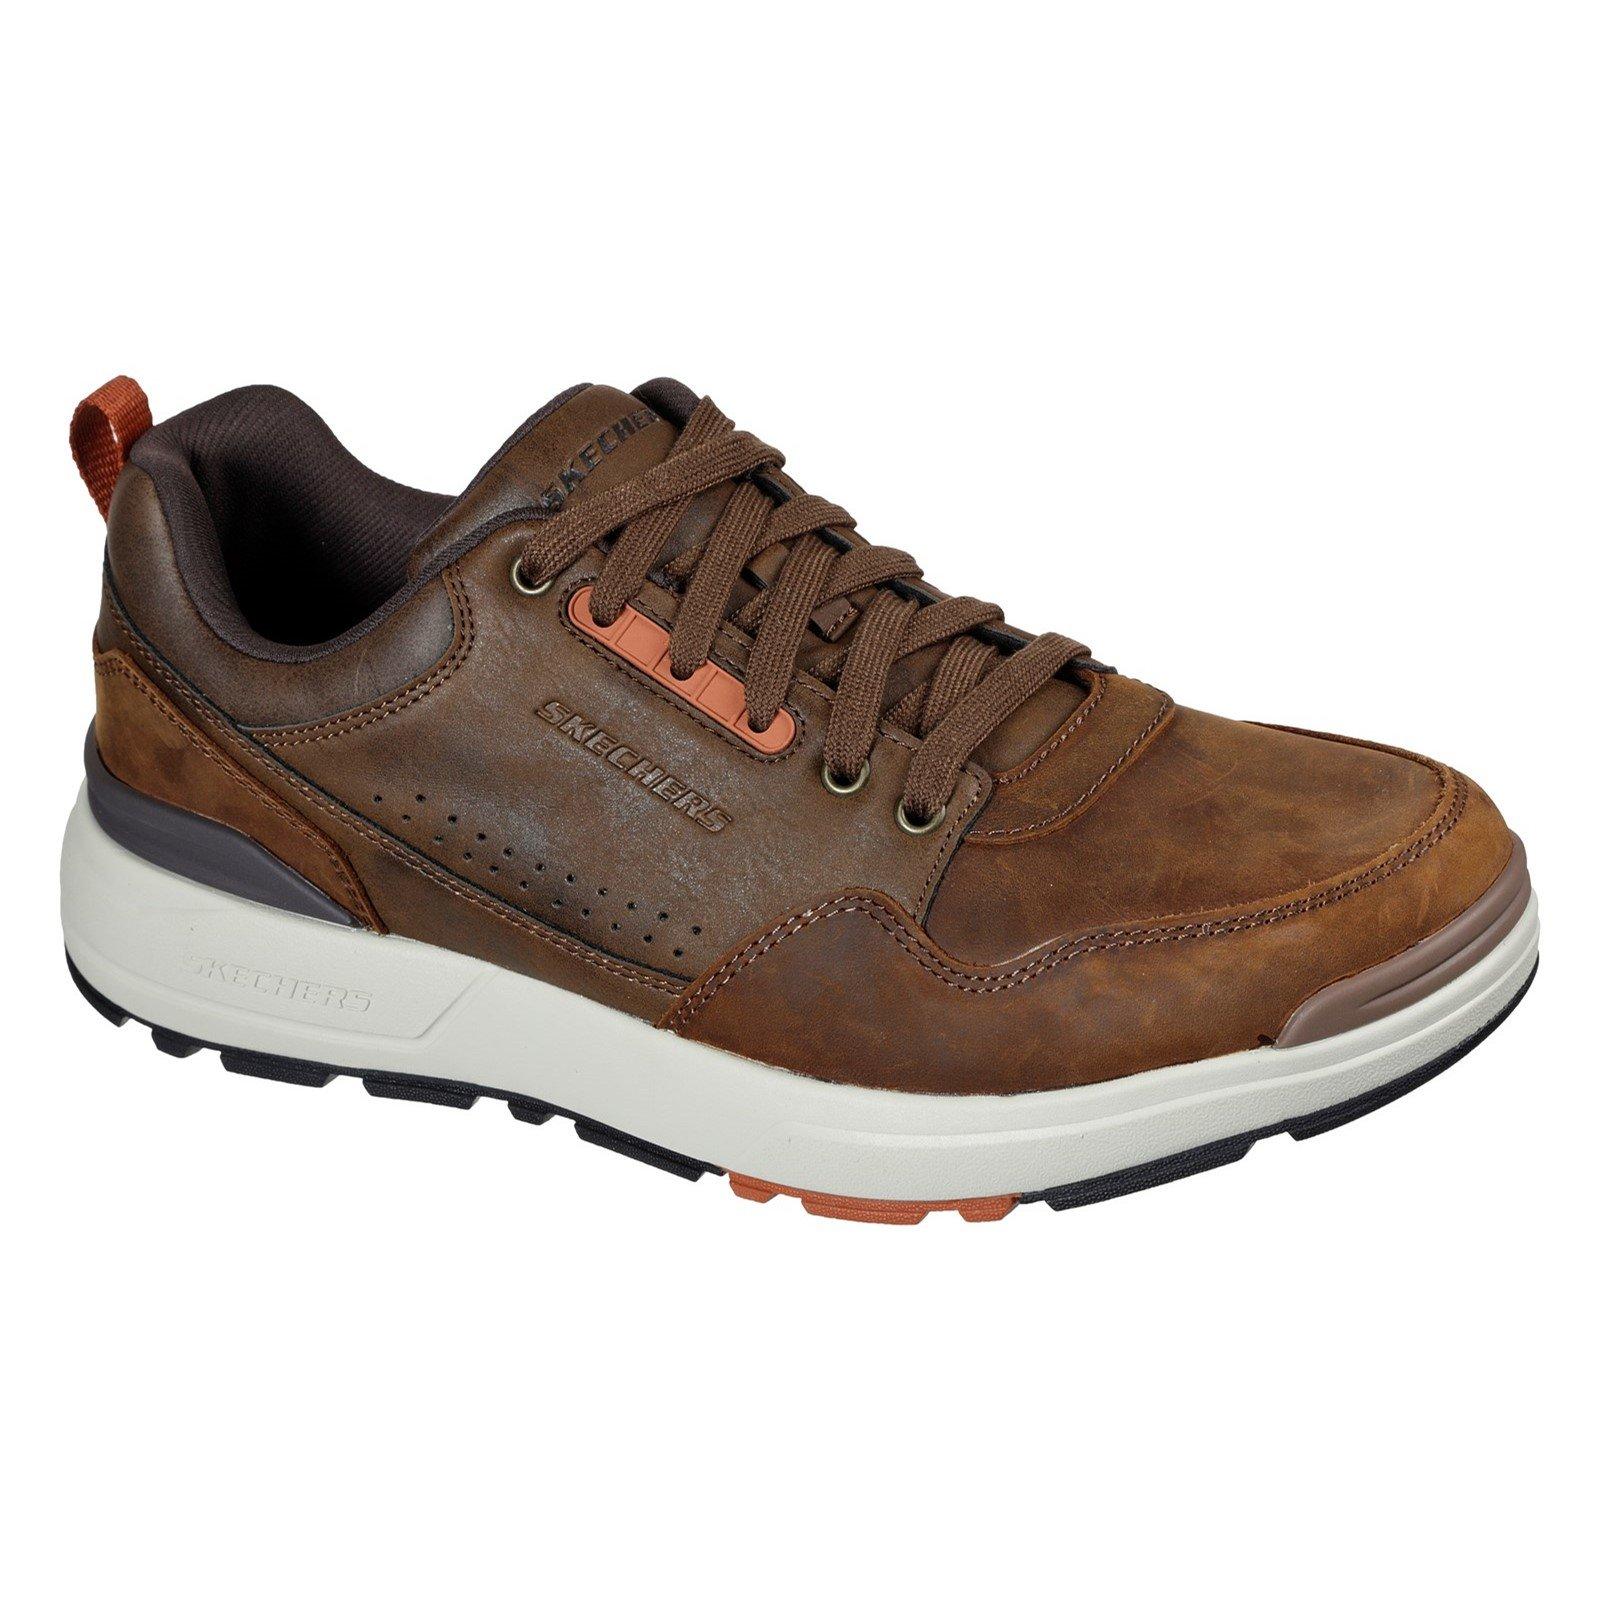 Skechers Men's Rozier Mancer Trainer Multicolor 32450 - Chocolate/Dark Brown 11